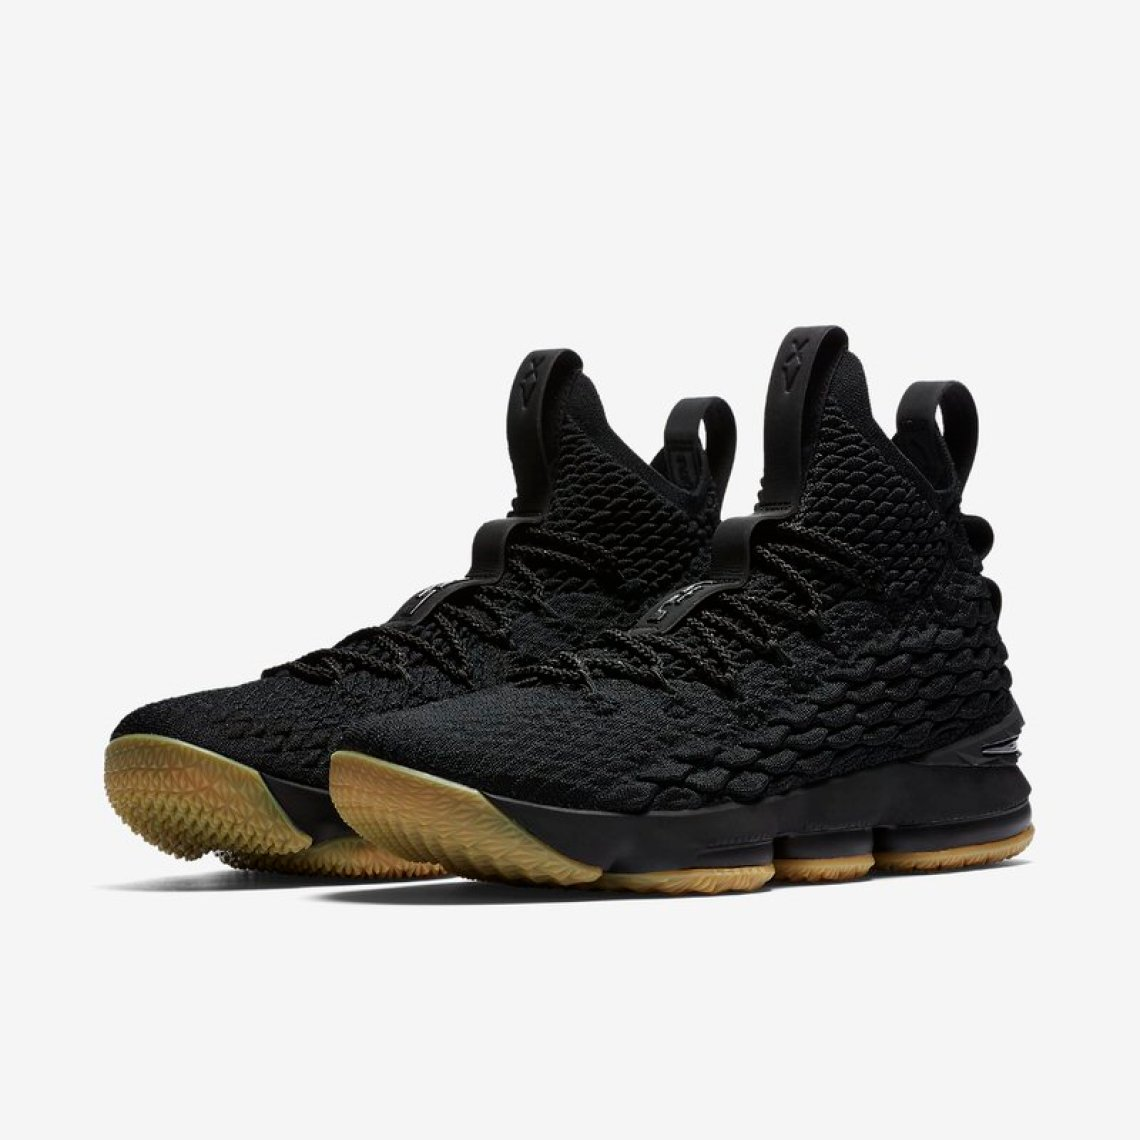 pretty nice 617d2 245f3 Nike LeBron 15 Black/Gum // Release Date | Nice Kicks